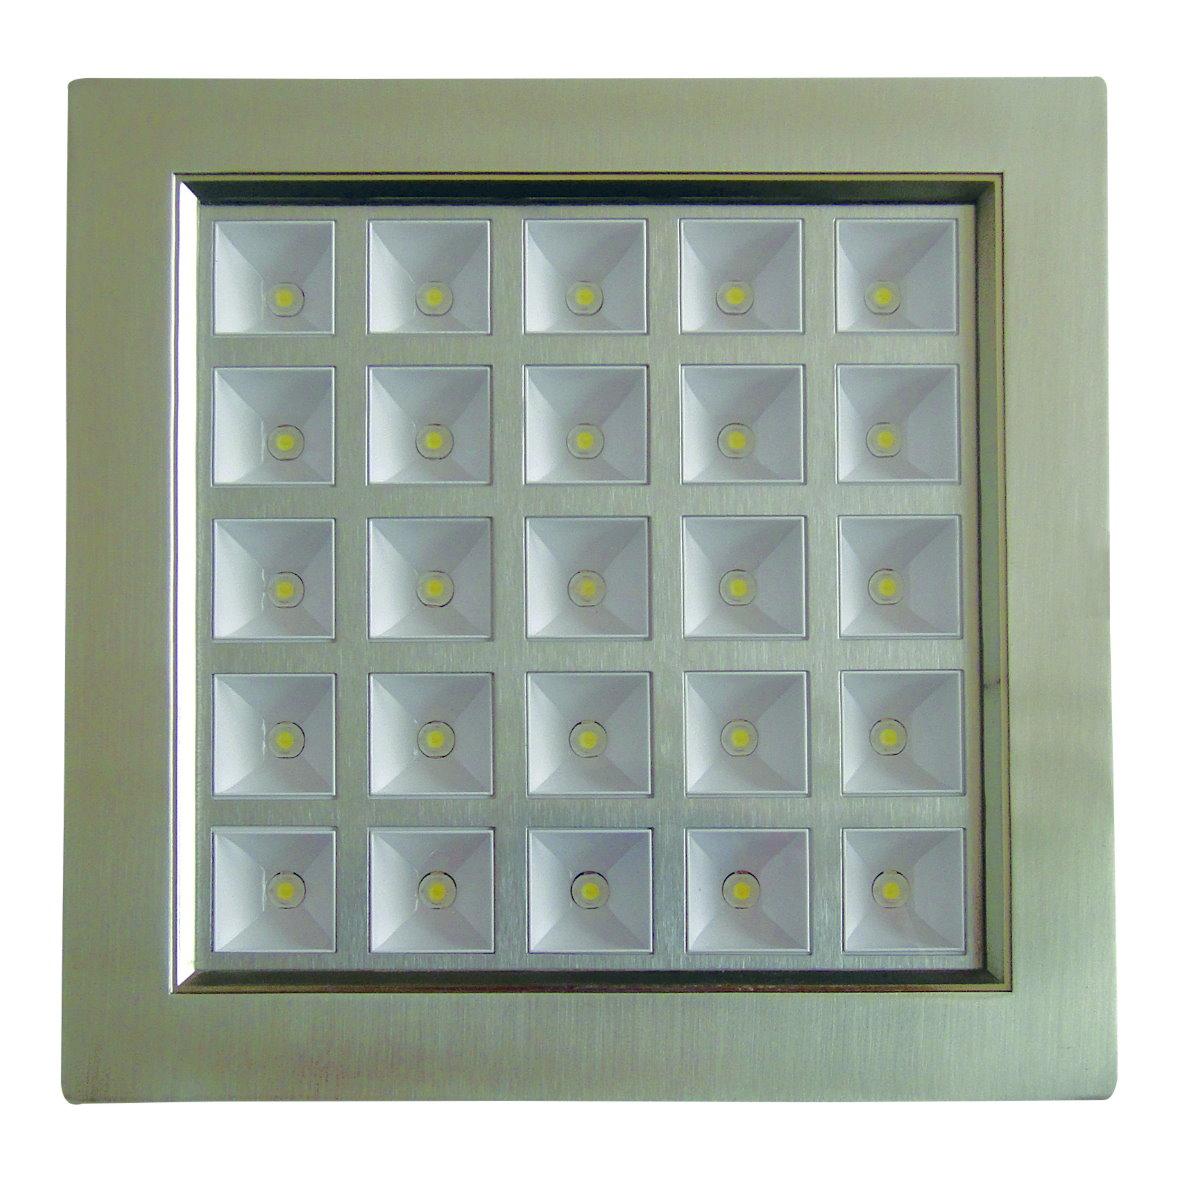 led panel einbaustrahler spot einbau strahler leuchte aluminium bis 25w 1900lm. Black Bedroom Furniture Sets. Home Design Ideas